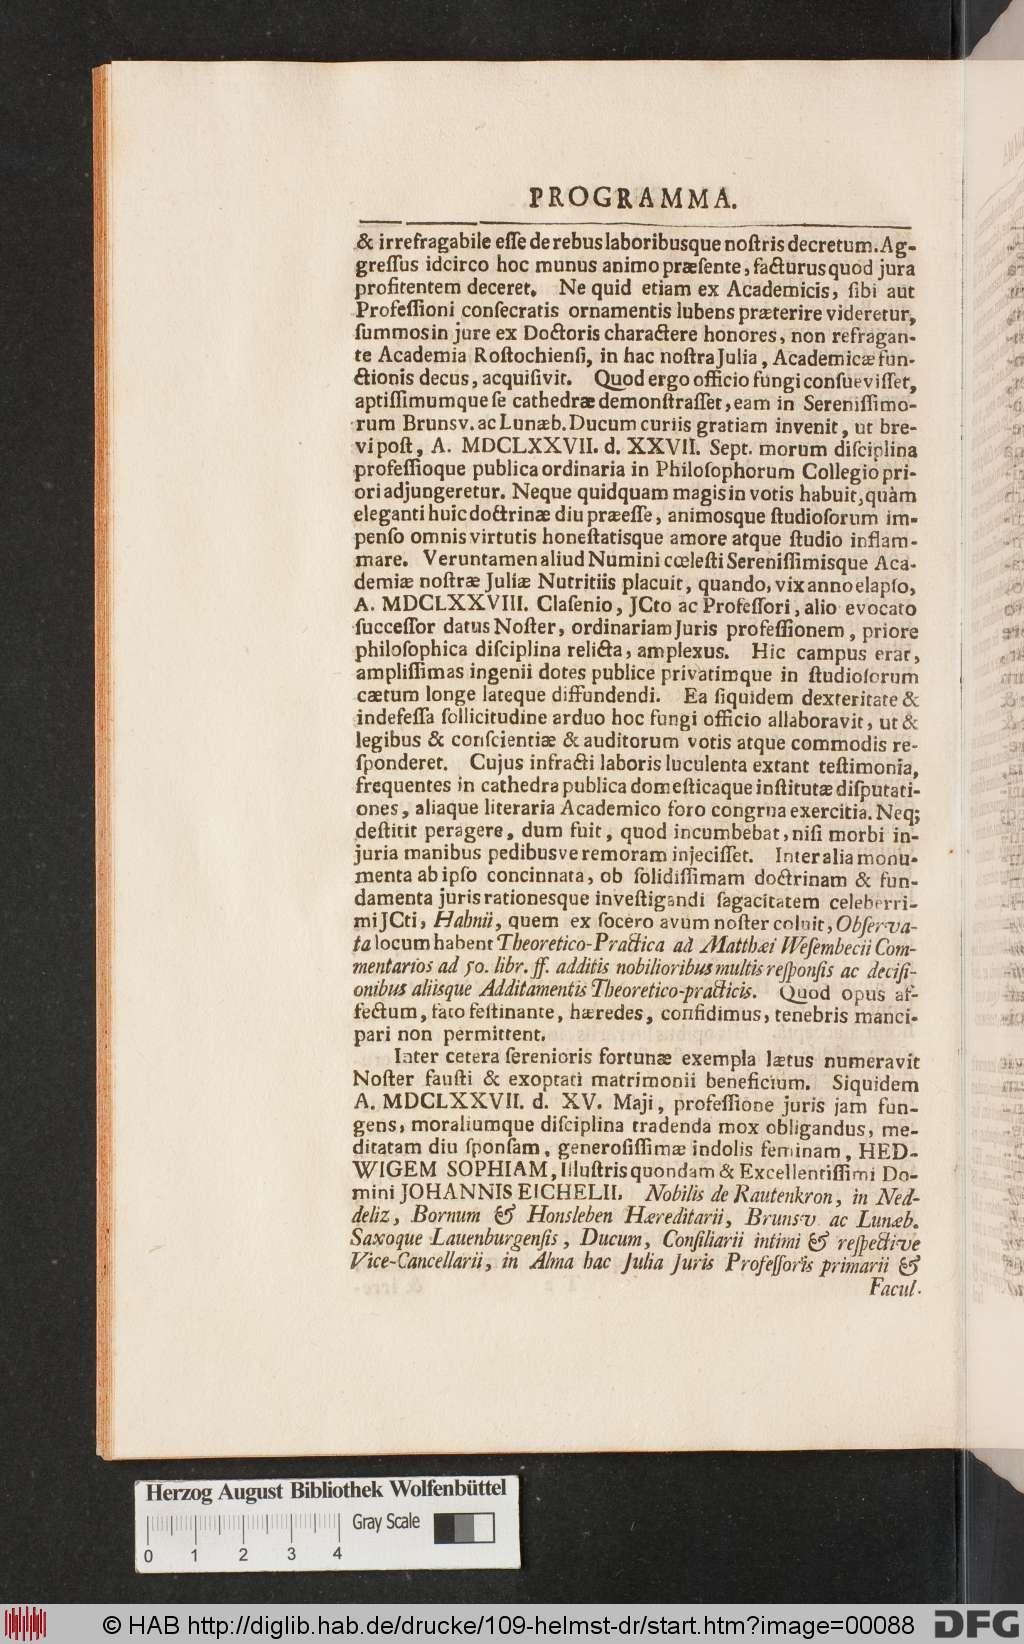 http://diglib.hab.de/drucke/109-helmst-dr/00088.jpg